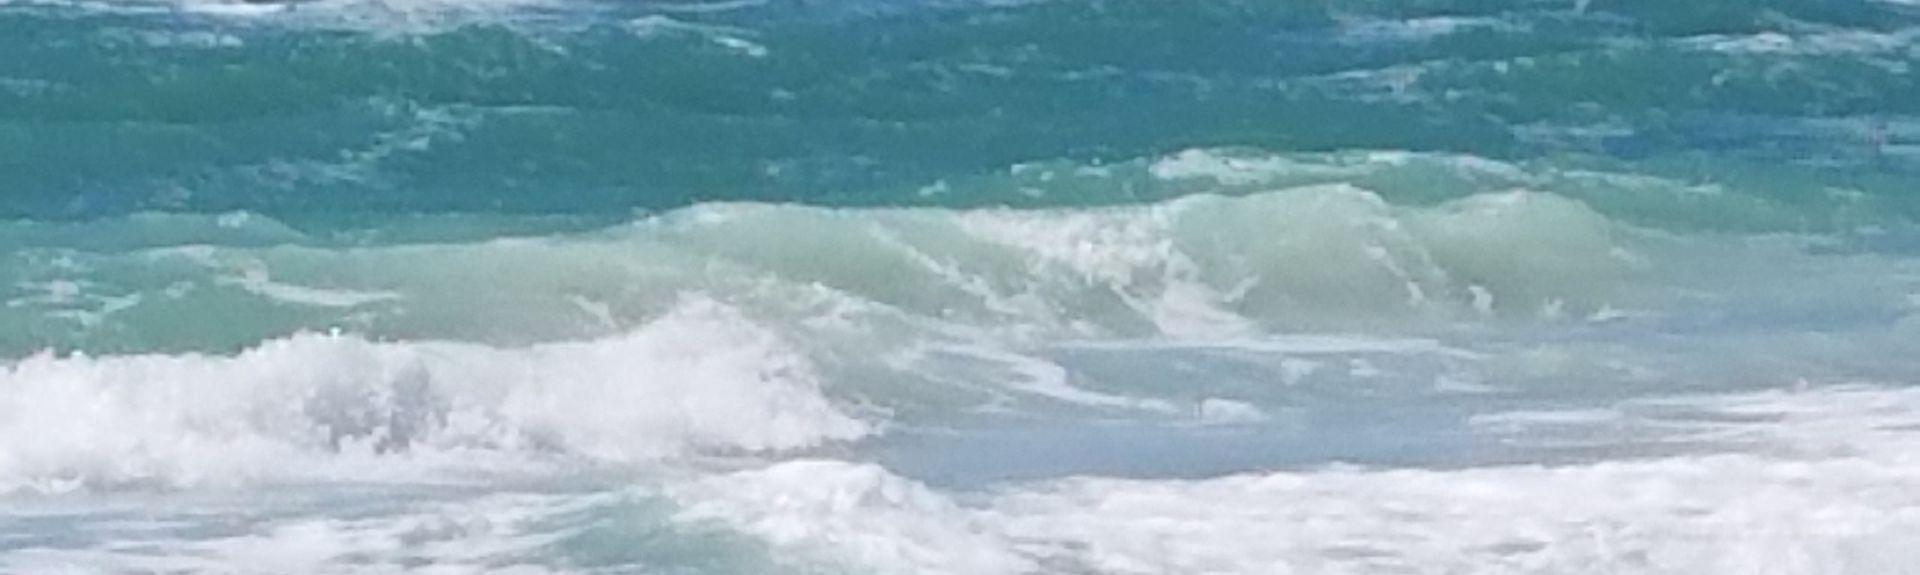 Ilexhurst, Holmes Beach, FL, USA